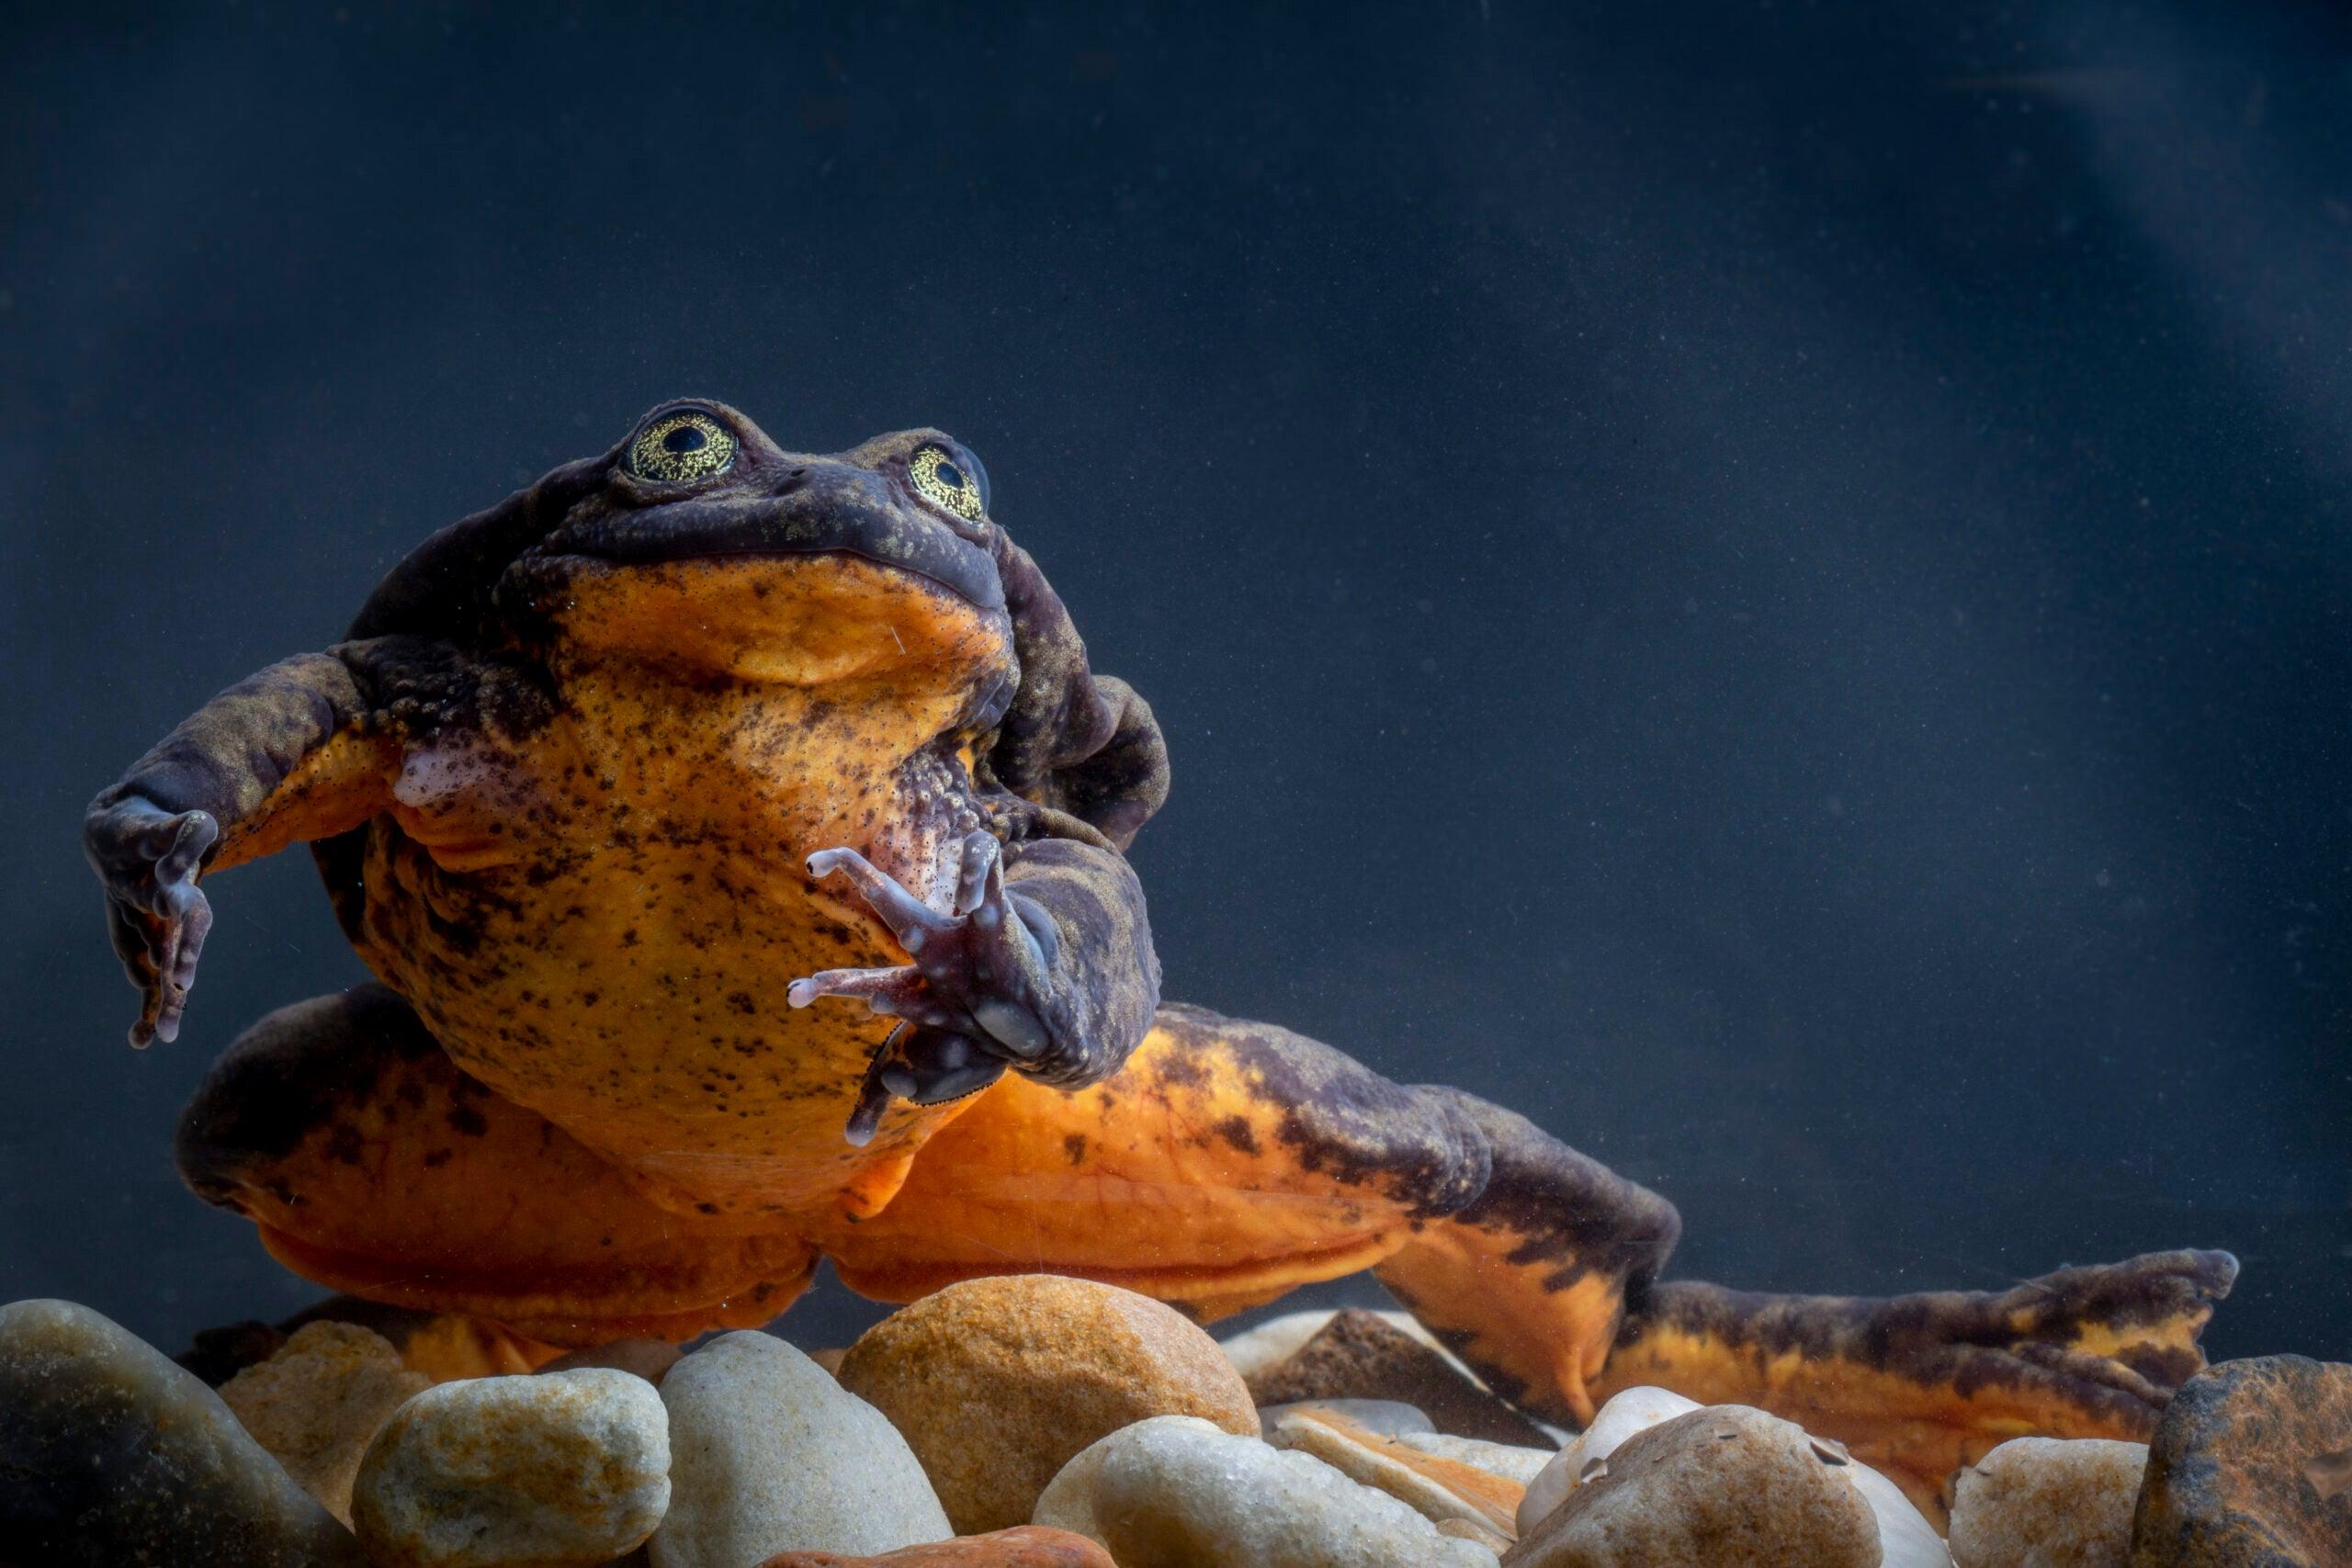 Mini frog, two frog, pumpkin frog, new frog